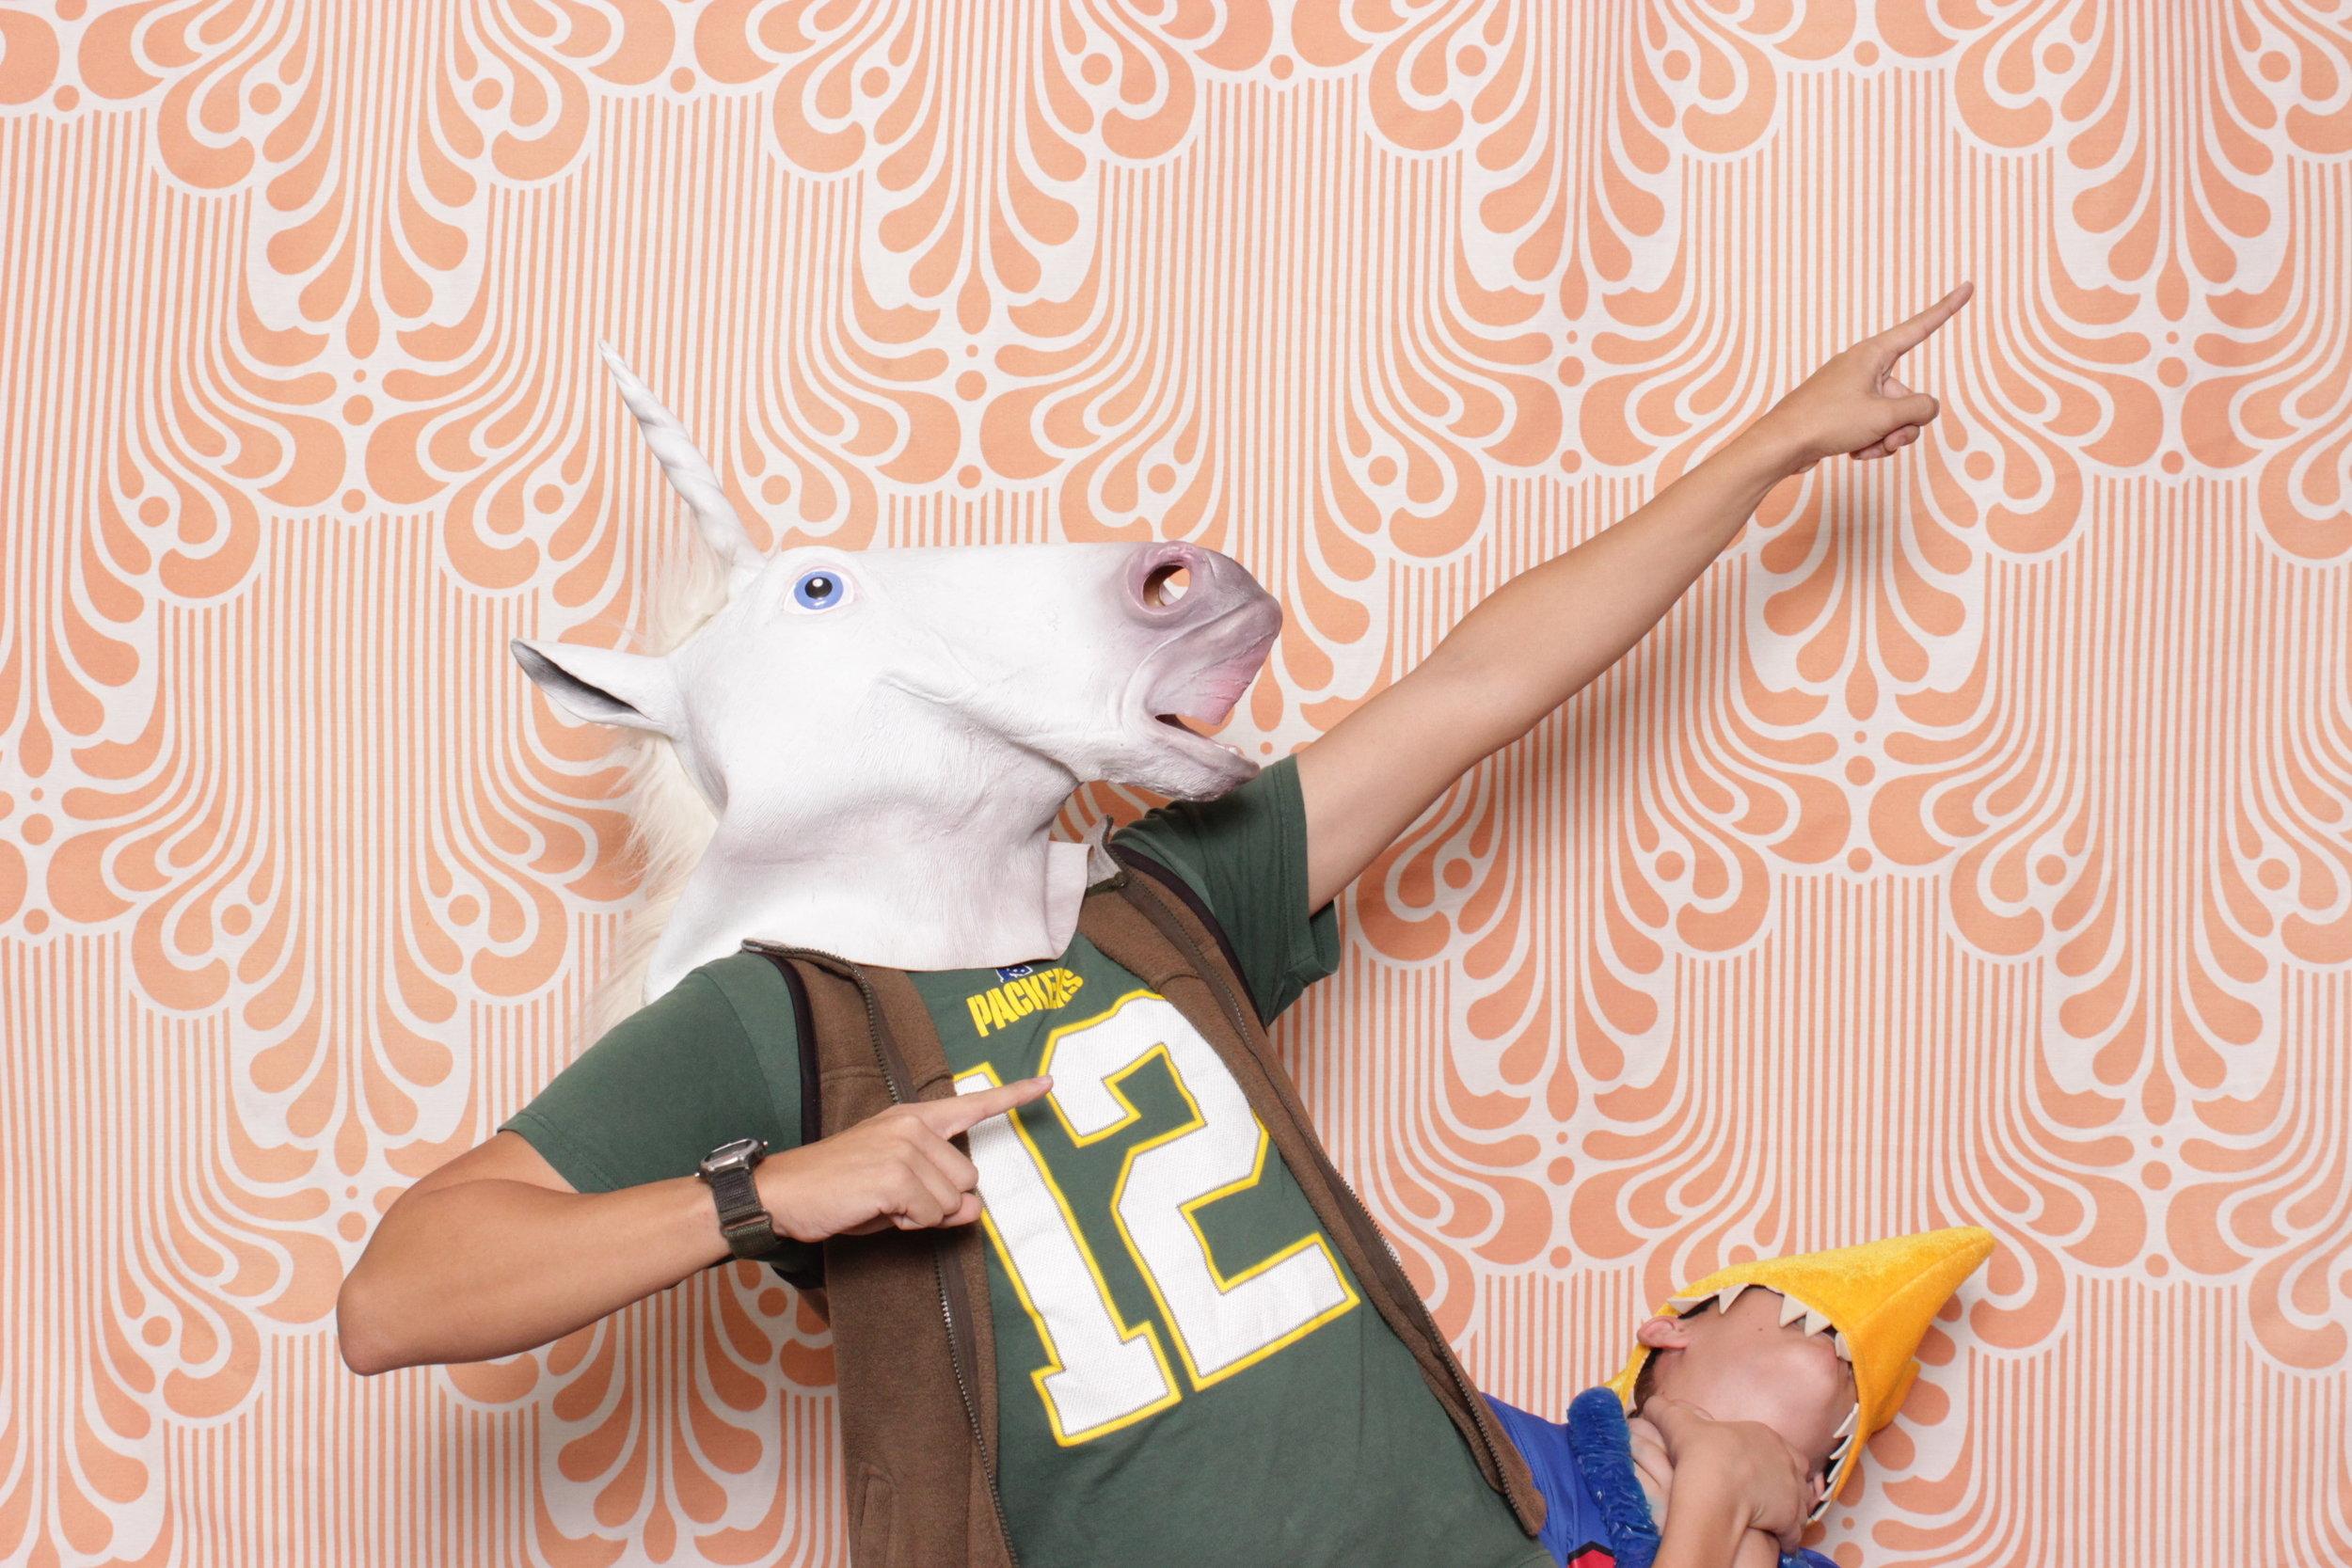 Infinite-hawaiian-luau-party-photo-booth-rental-chico-unicorn